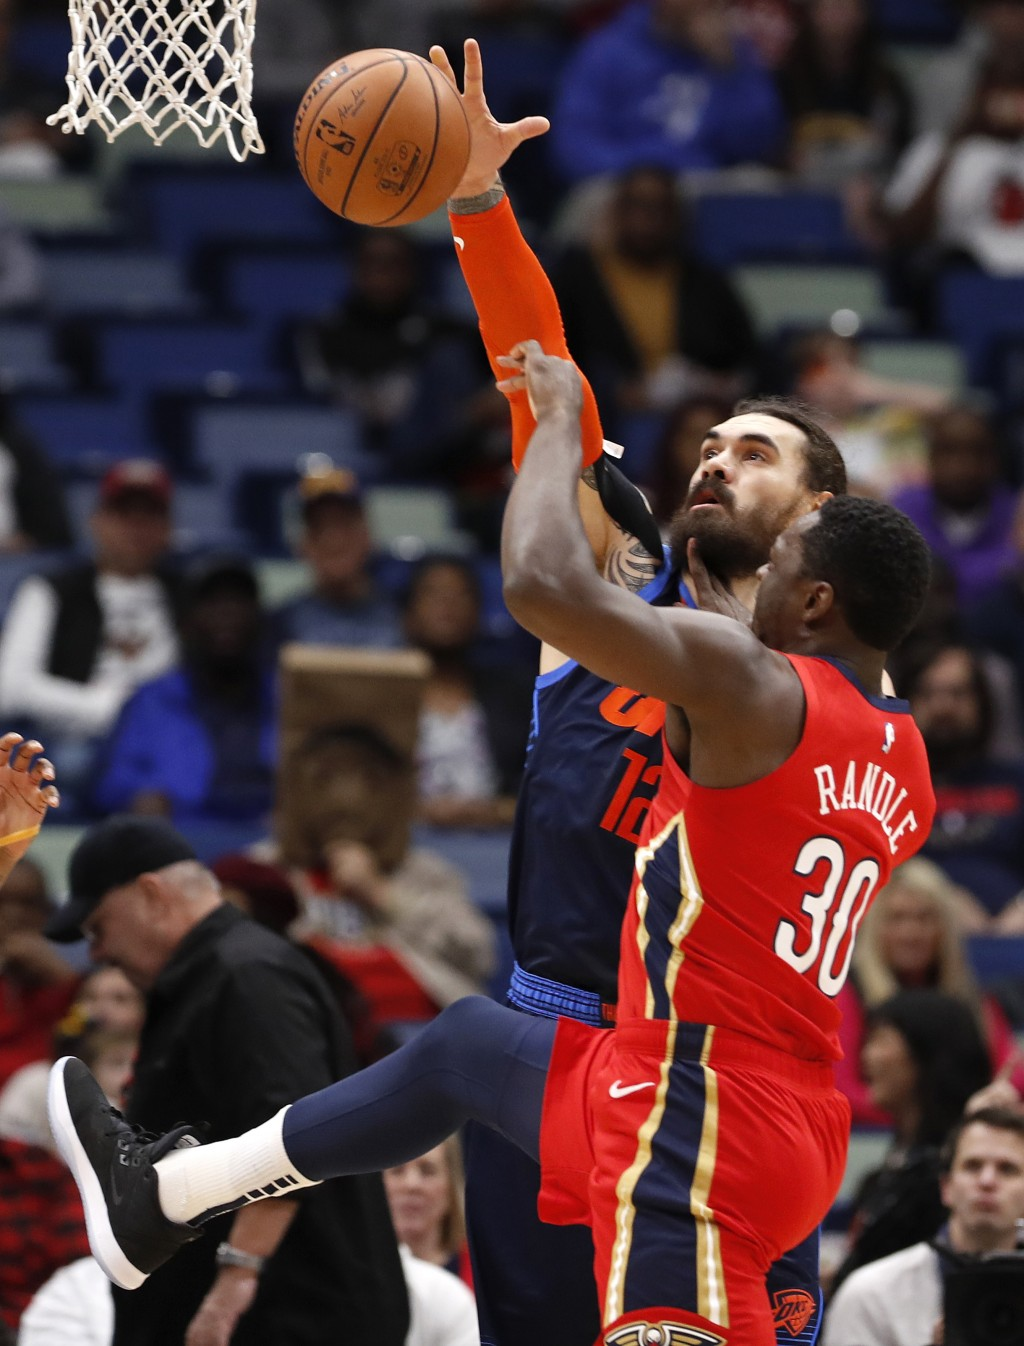 Oklahoma City Thunder center Steven Adams (12) blocks a shot from New Orleans Pelicans center Julius Randle (30) during the first half of an NBA baske...